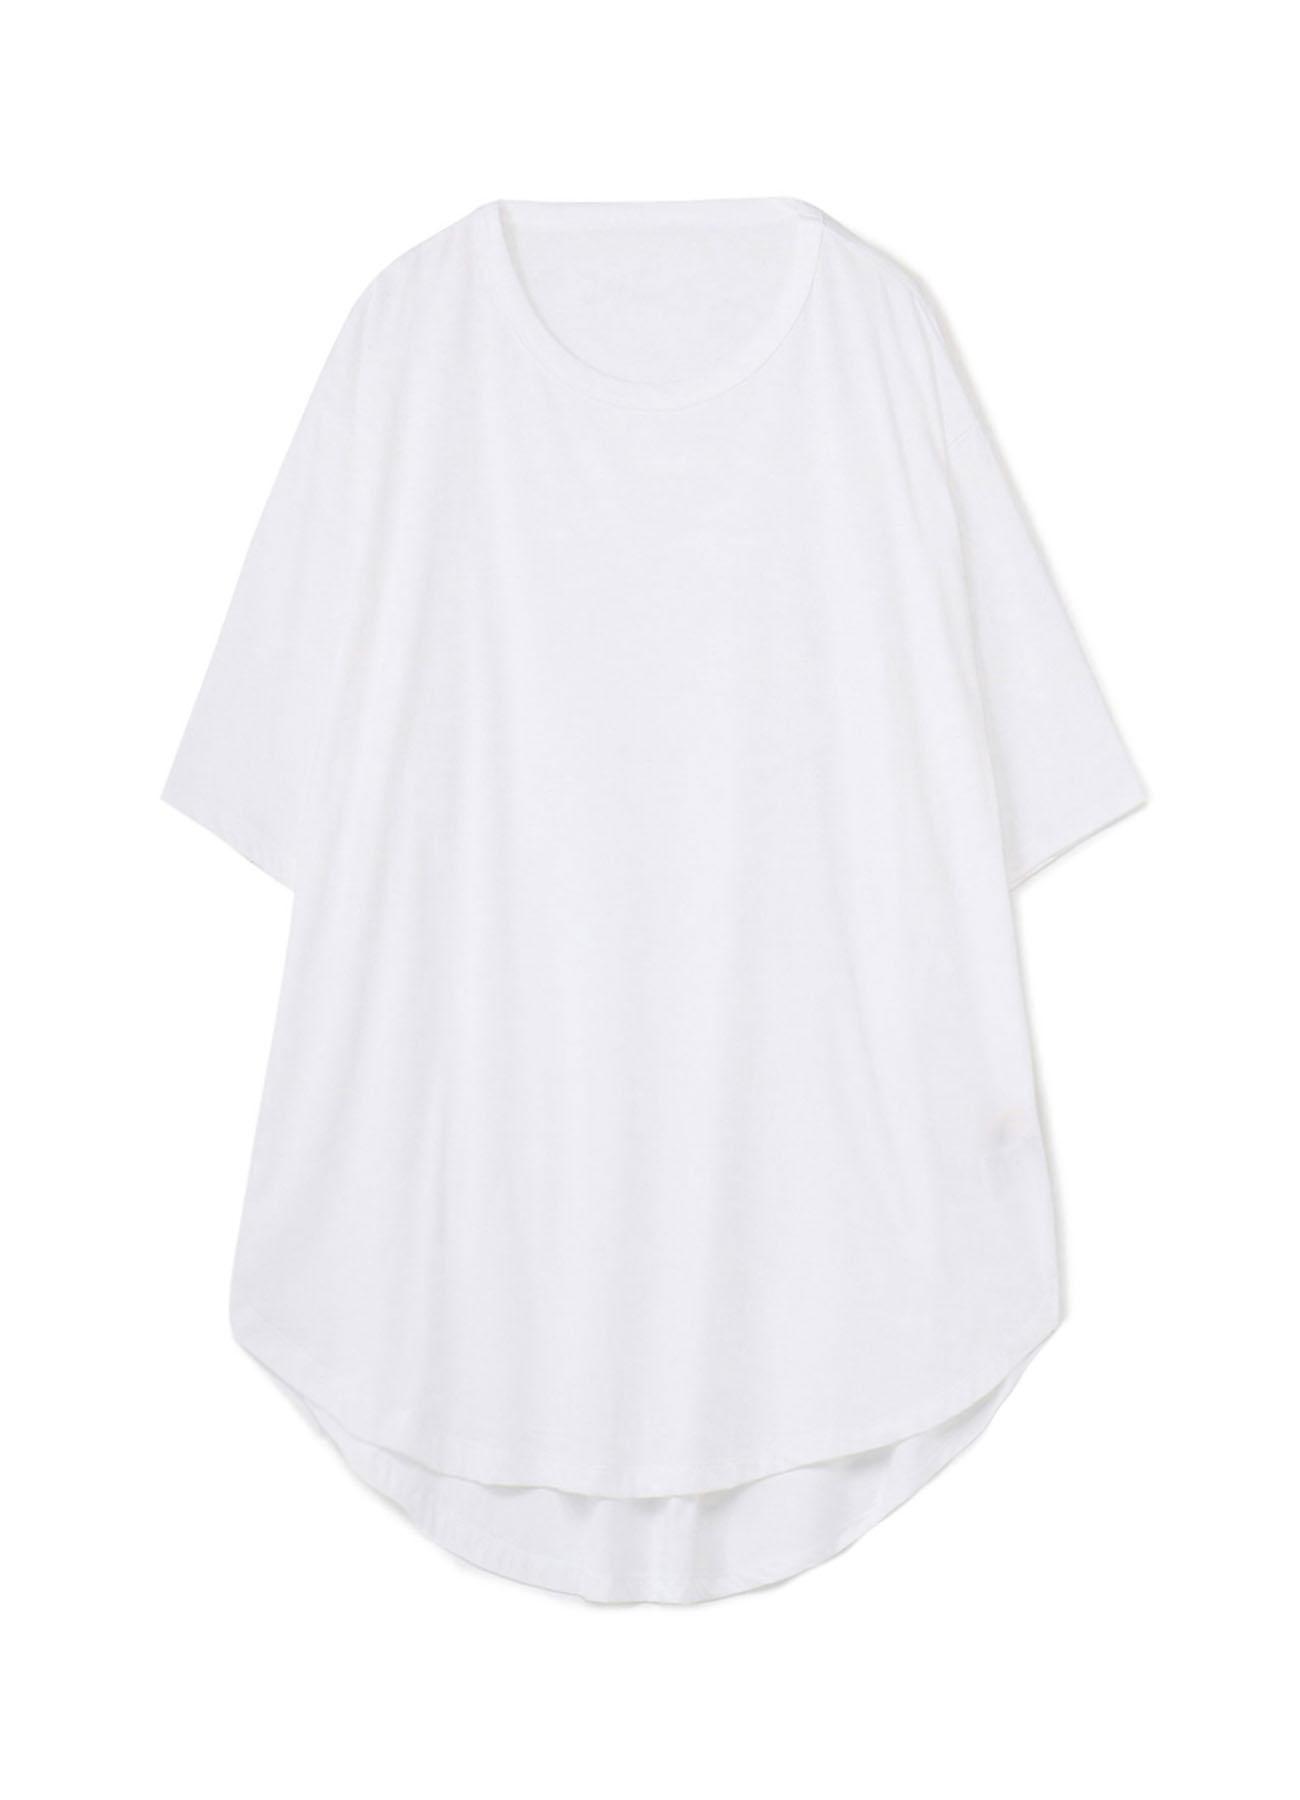 30/Cotton Jersey Jumbo Round Short Sleeves Cut Sew